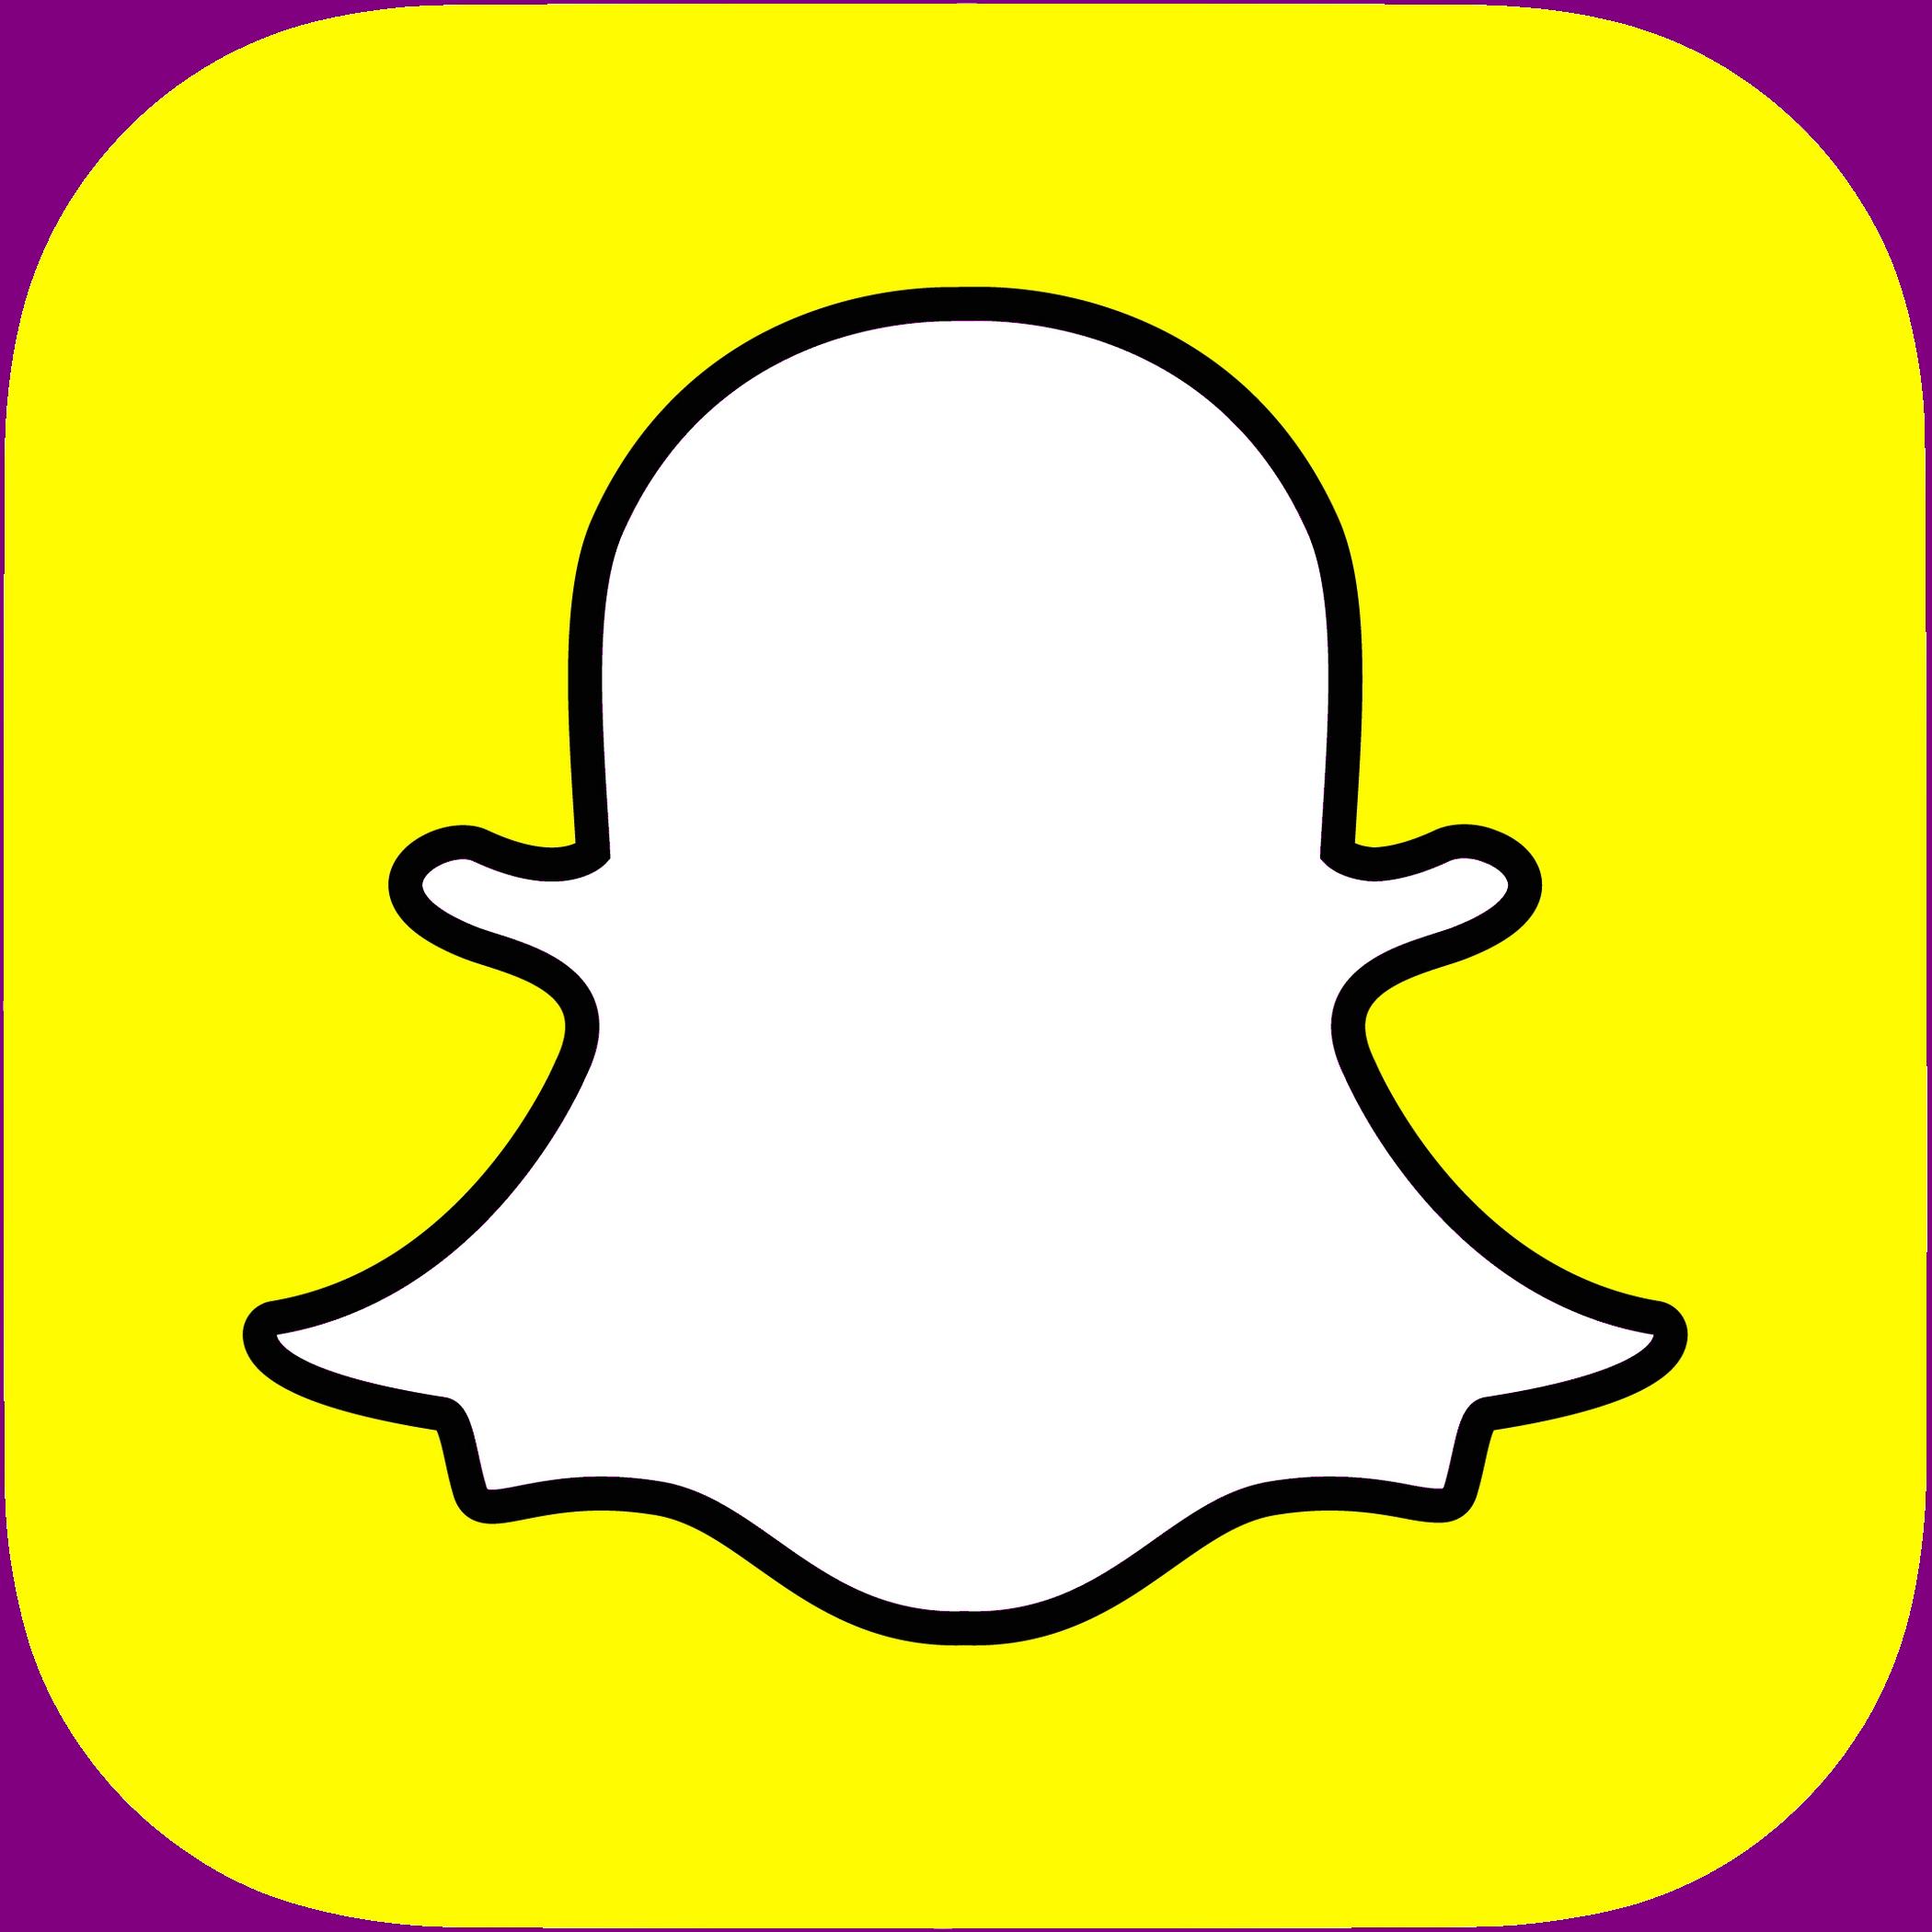 Fichier:Logo-Snapchat.png - Logo Snapchat PNG